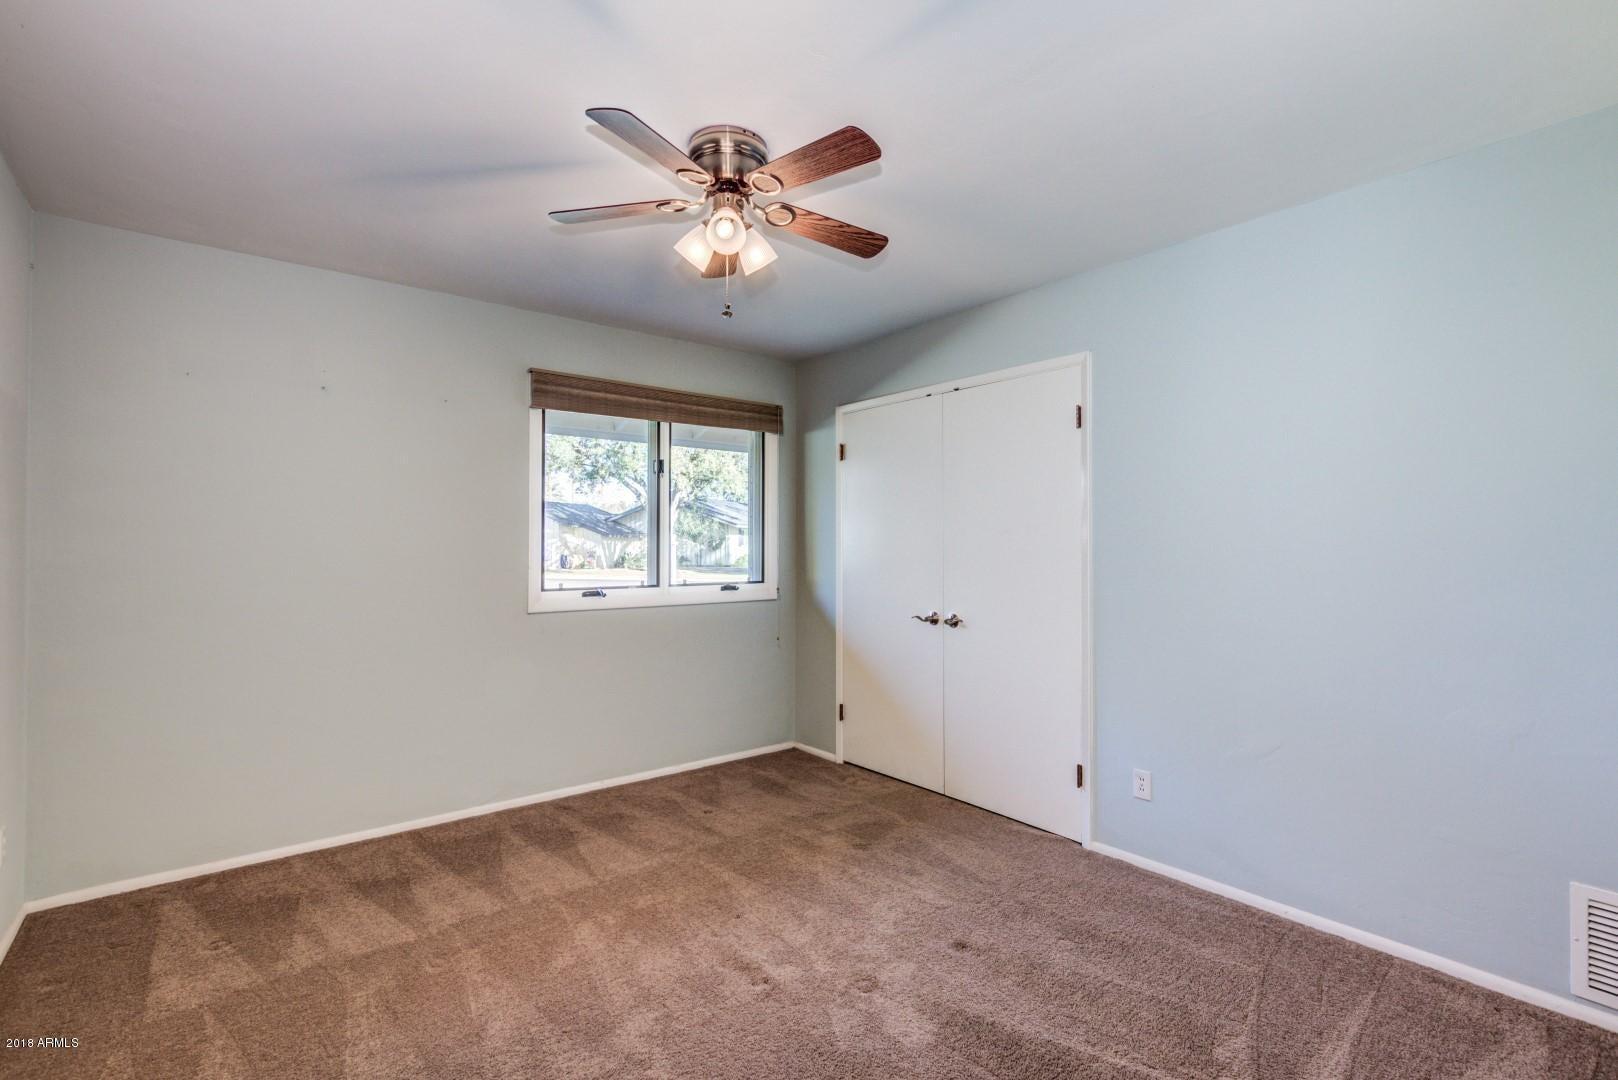 4102 N 52ND Street Phoenix, AZ 85018 - MLS #: 5731243